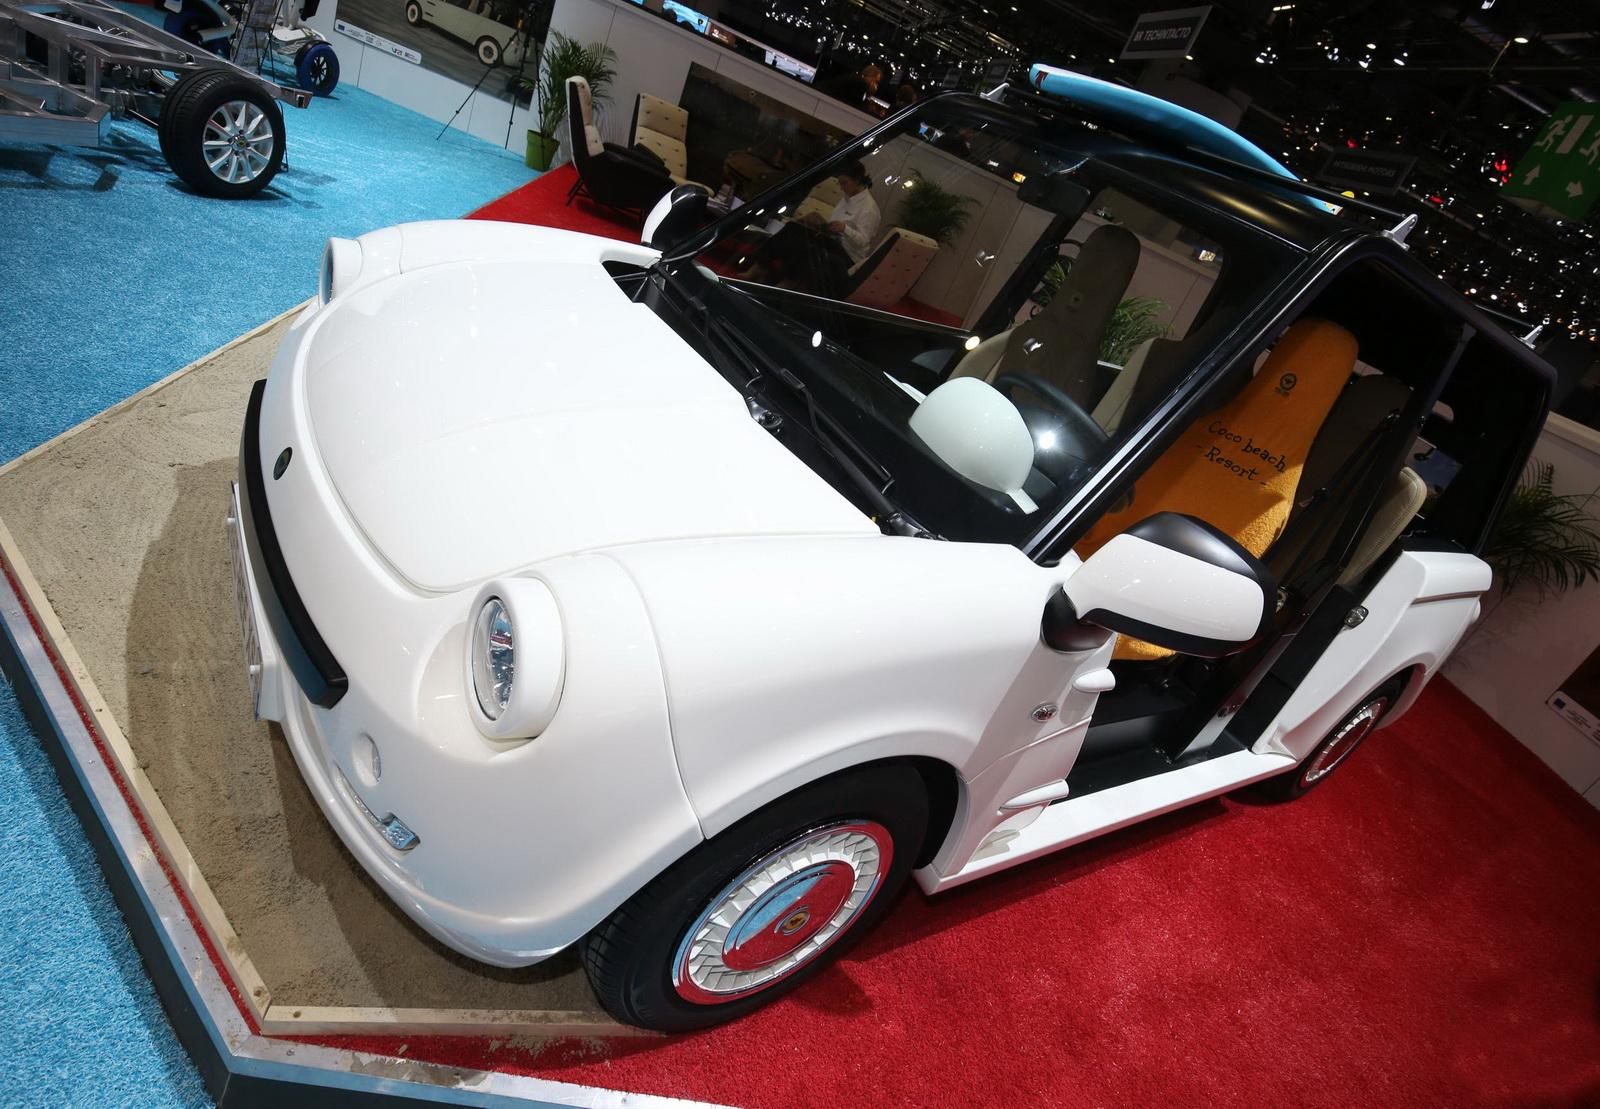 Xe điện Bee-Bee XS 6